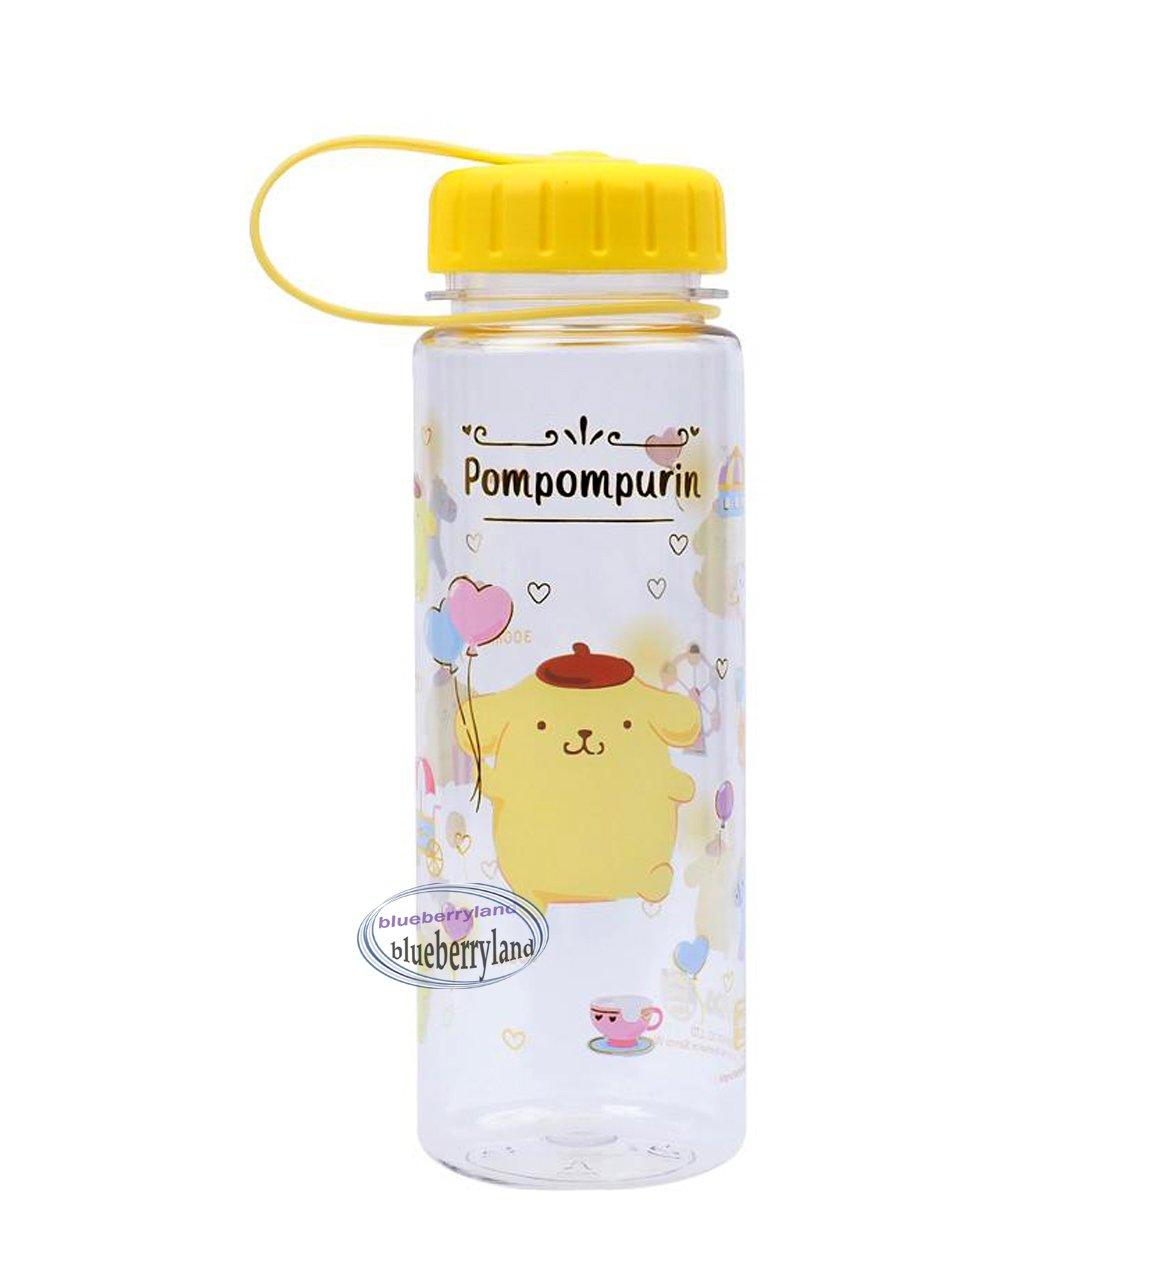 Sanrio Pompompurin Water Bottle BPA Free drinkware Juice container 450ml ladies girls kids